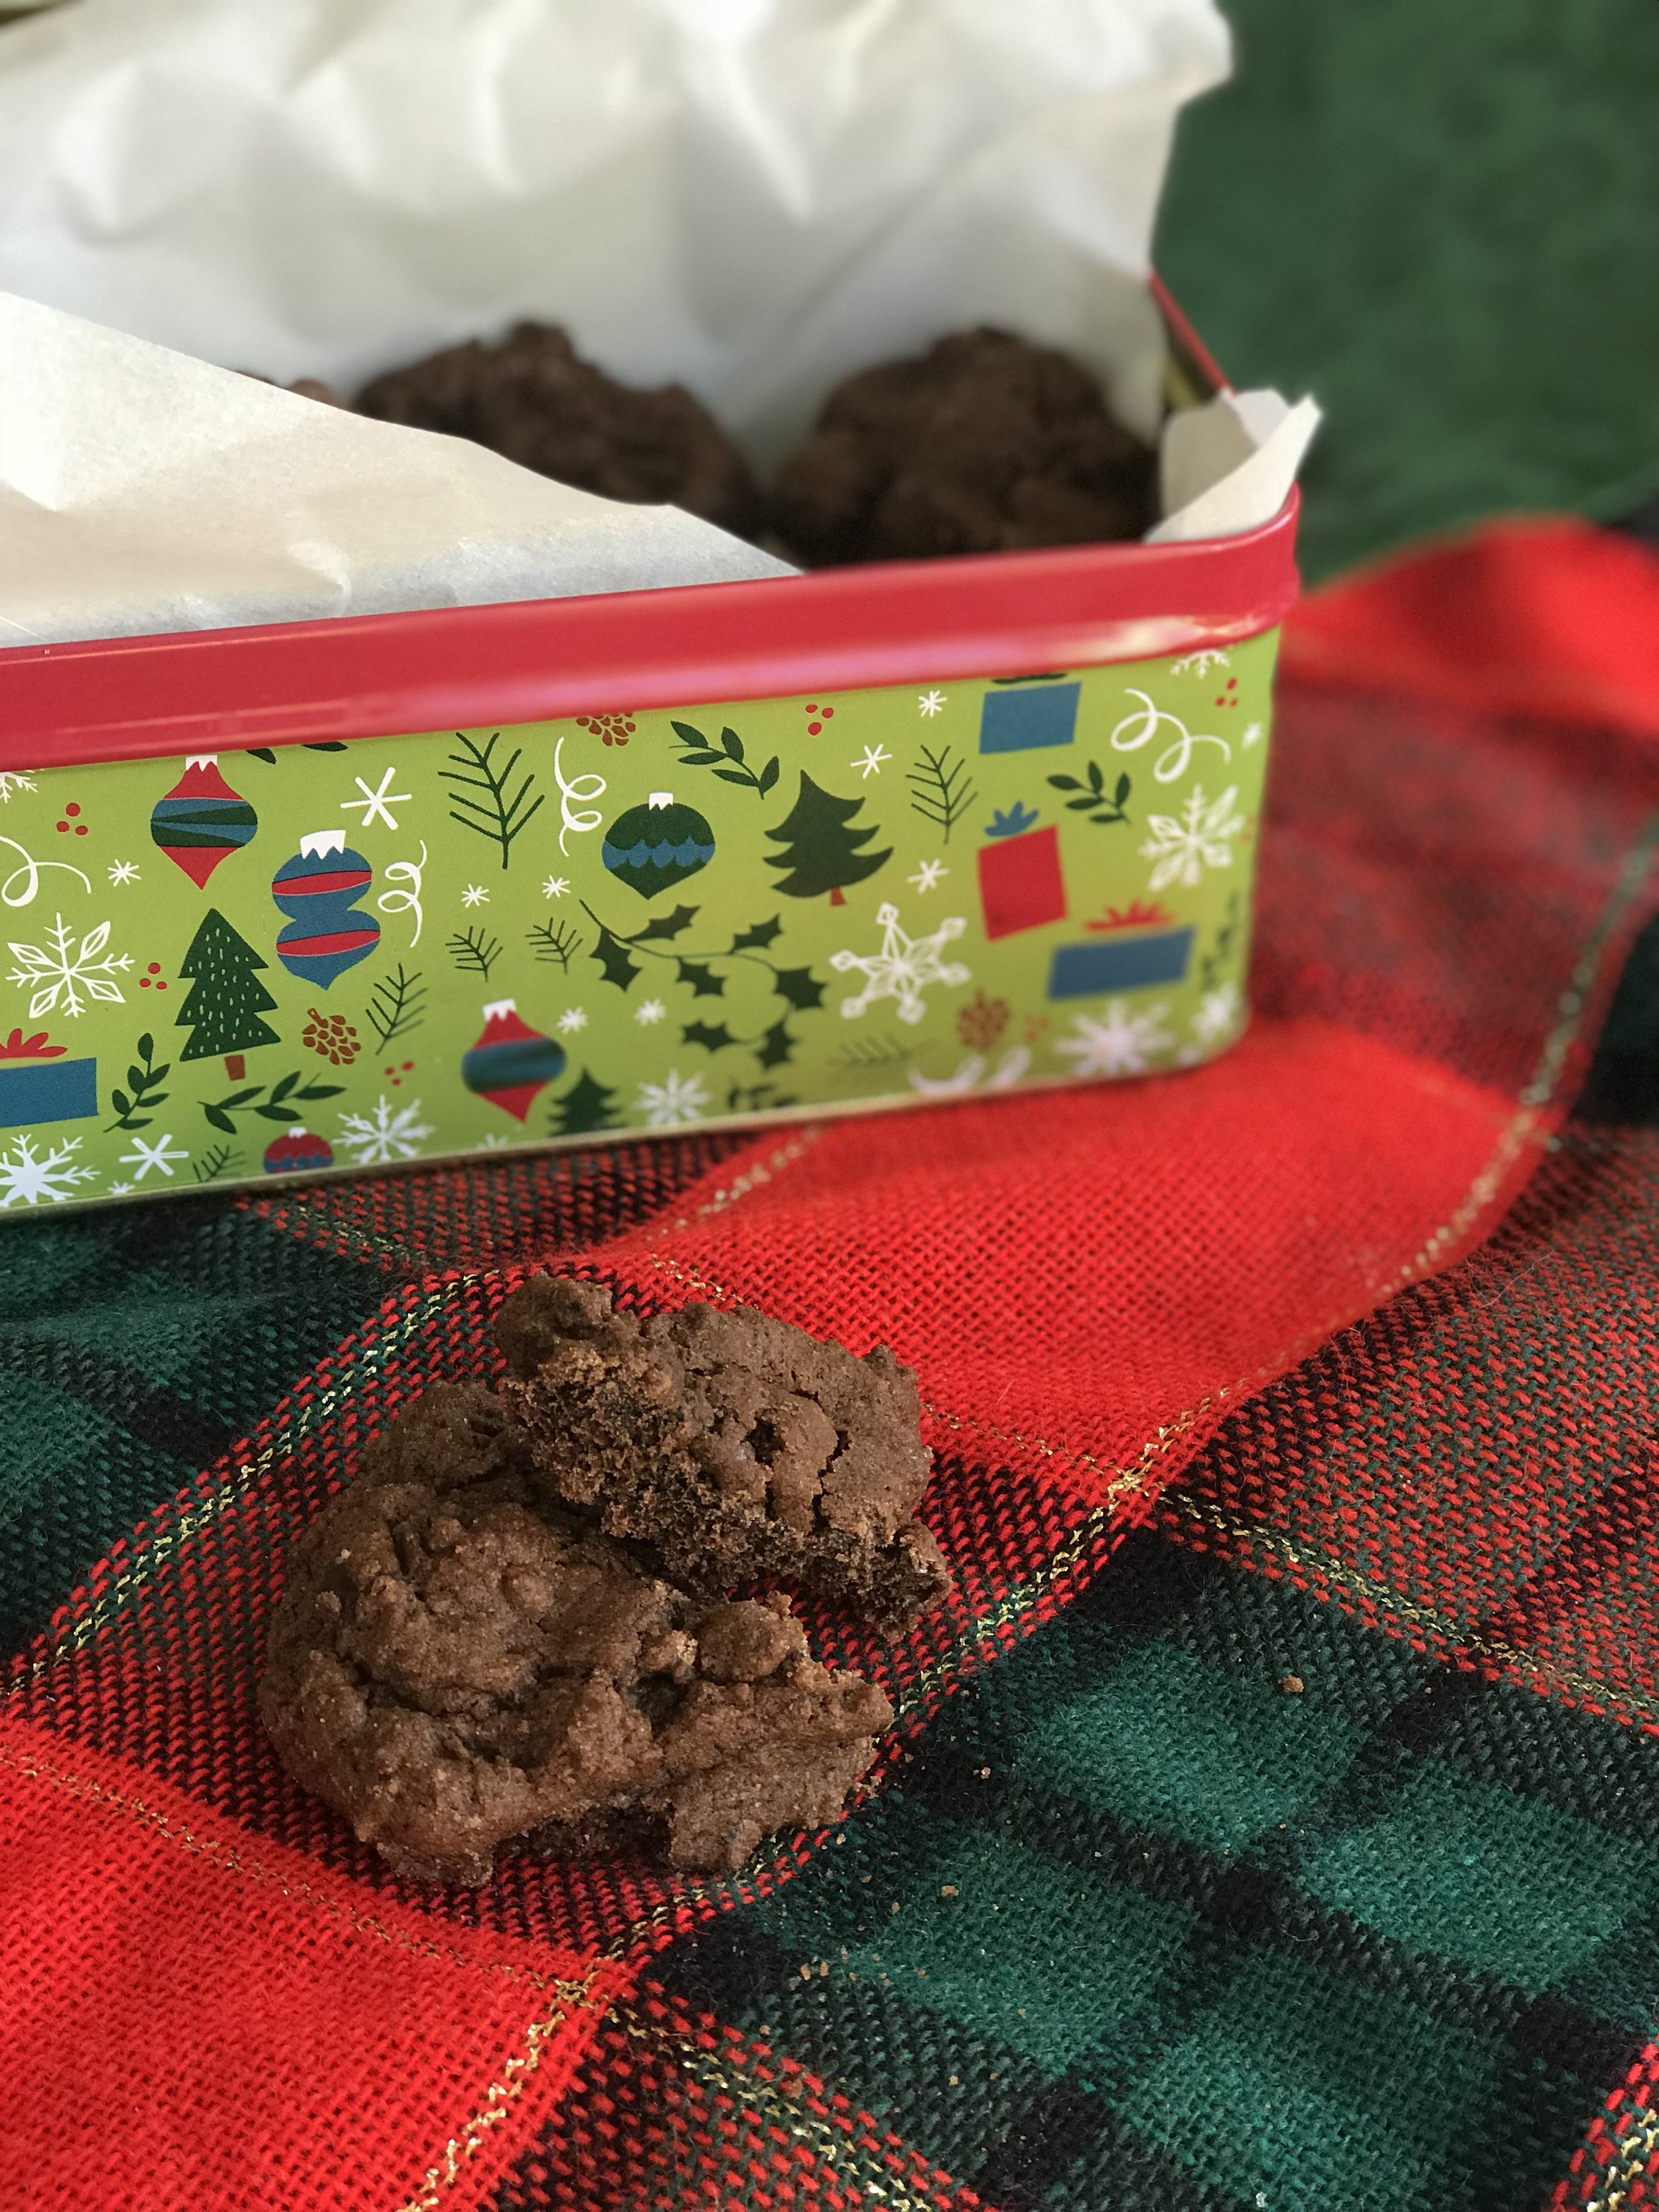 christmascookieschocolate (2).jpg